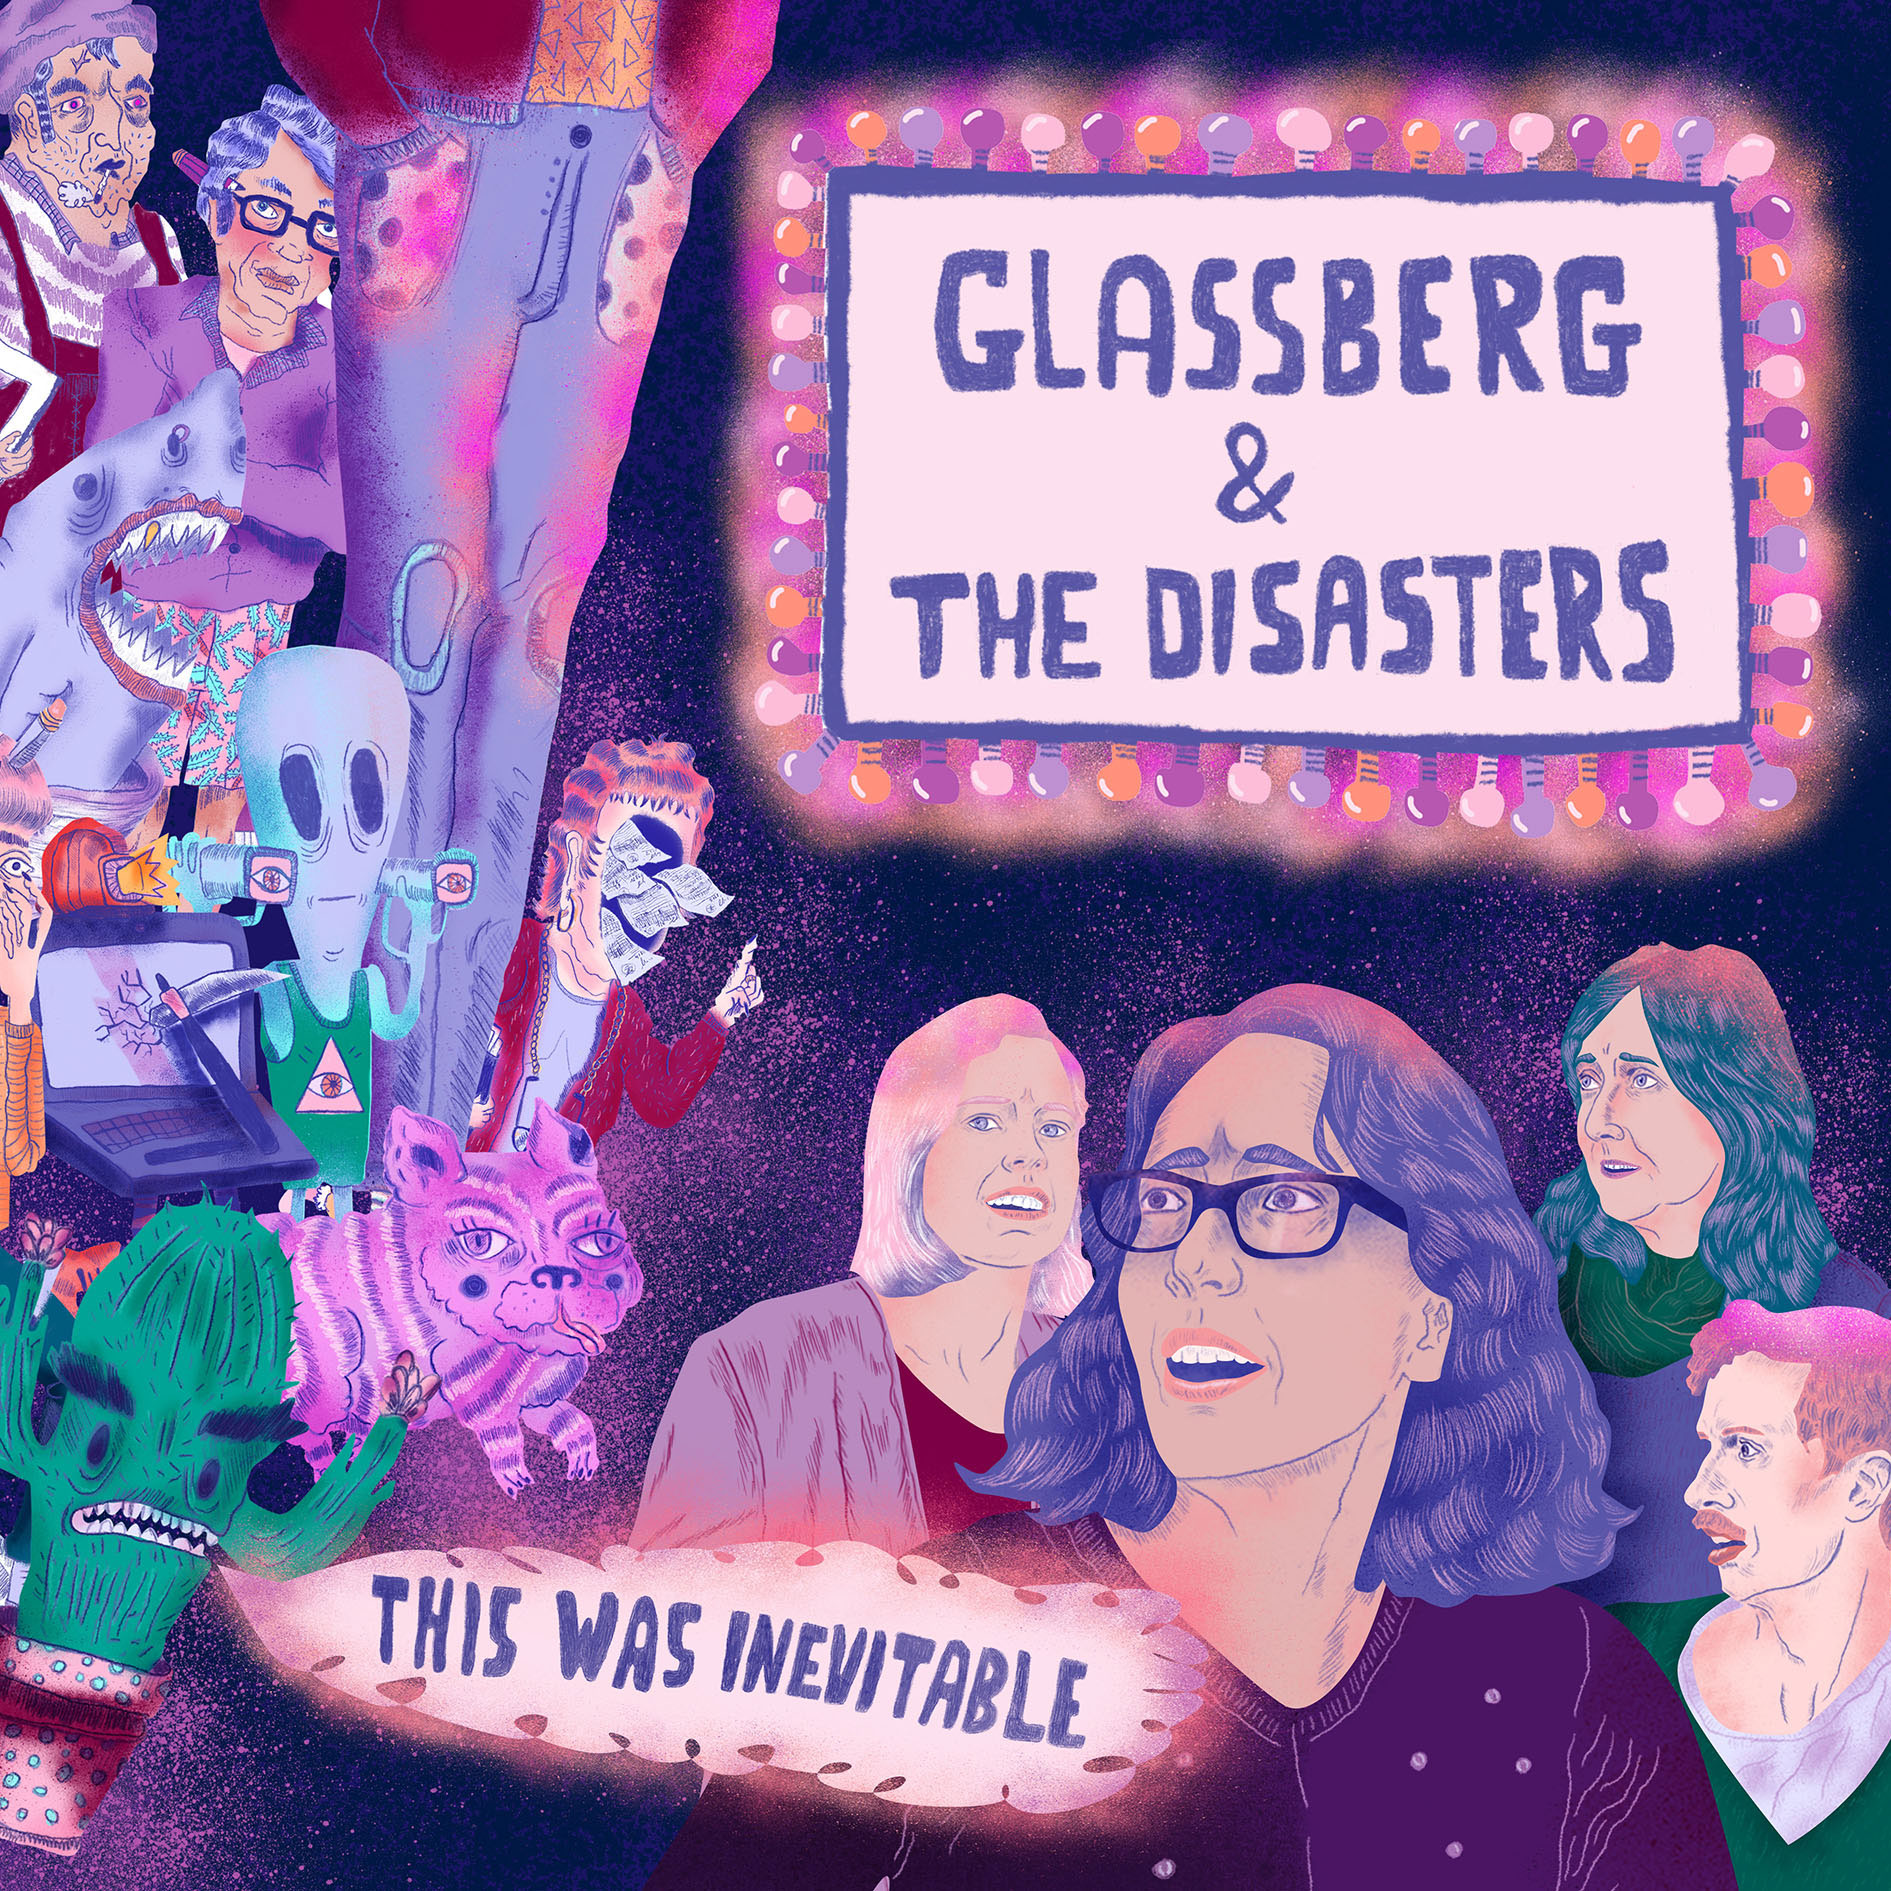 Glassberg & The Disasters Album Art